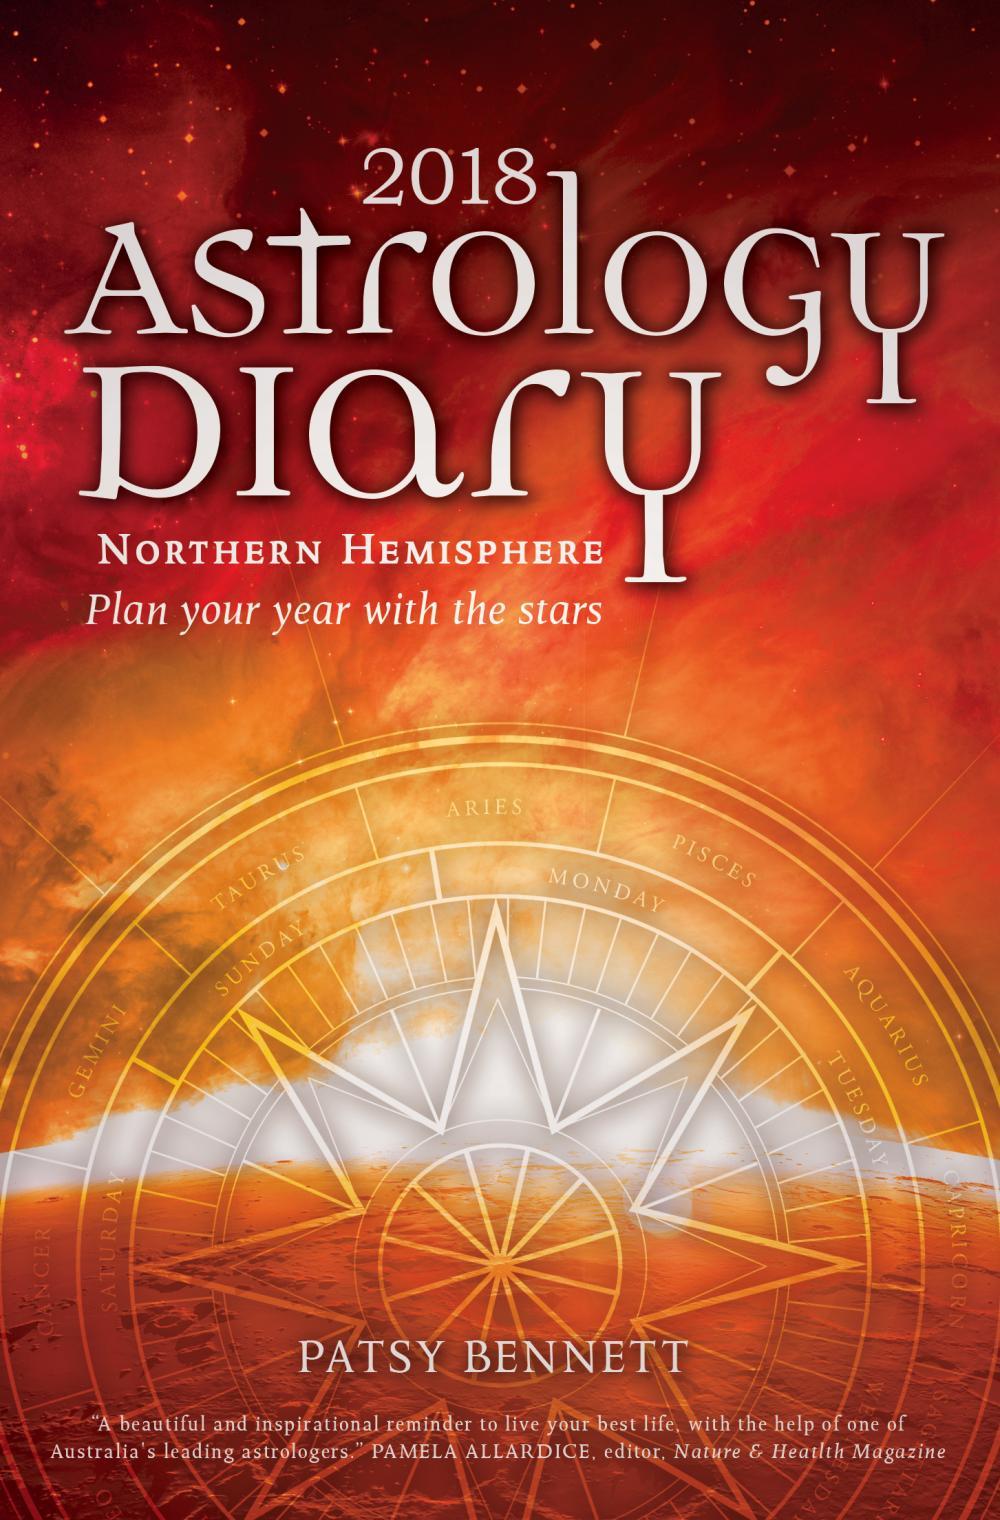 2018 Astrology Diary - Northern Hemisphe